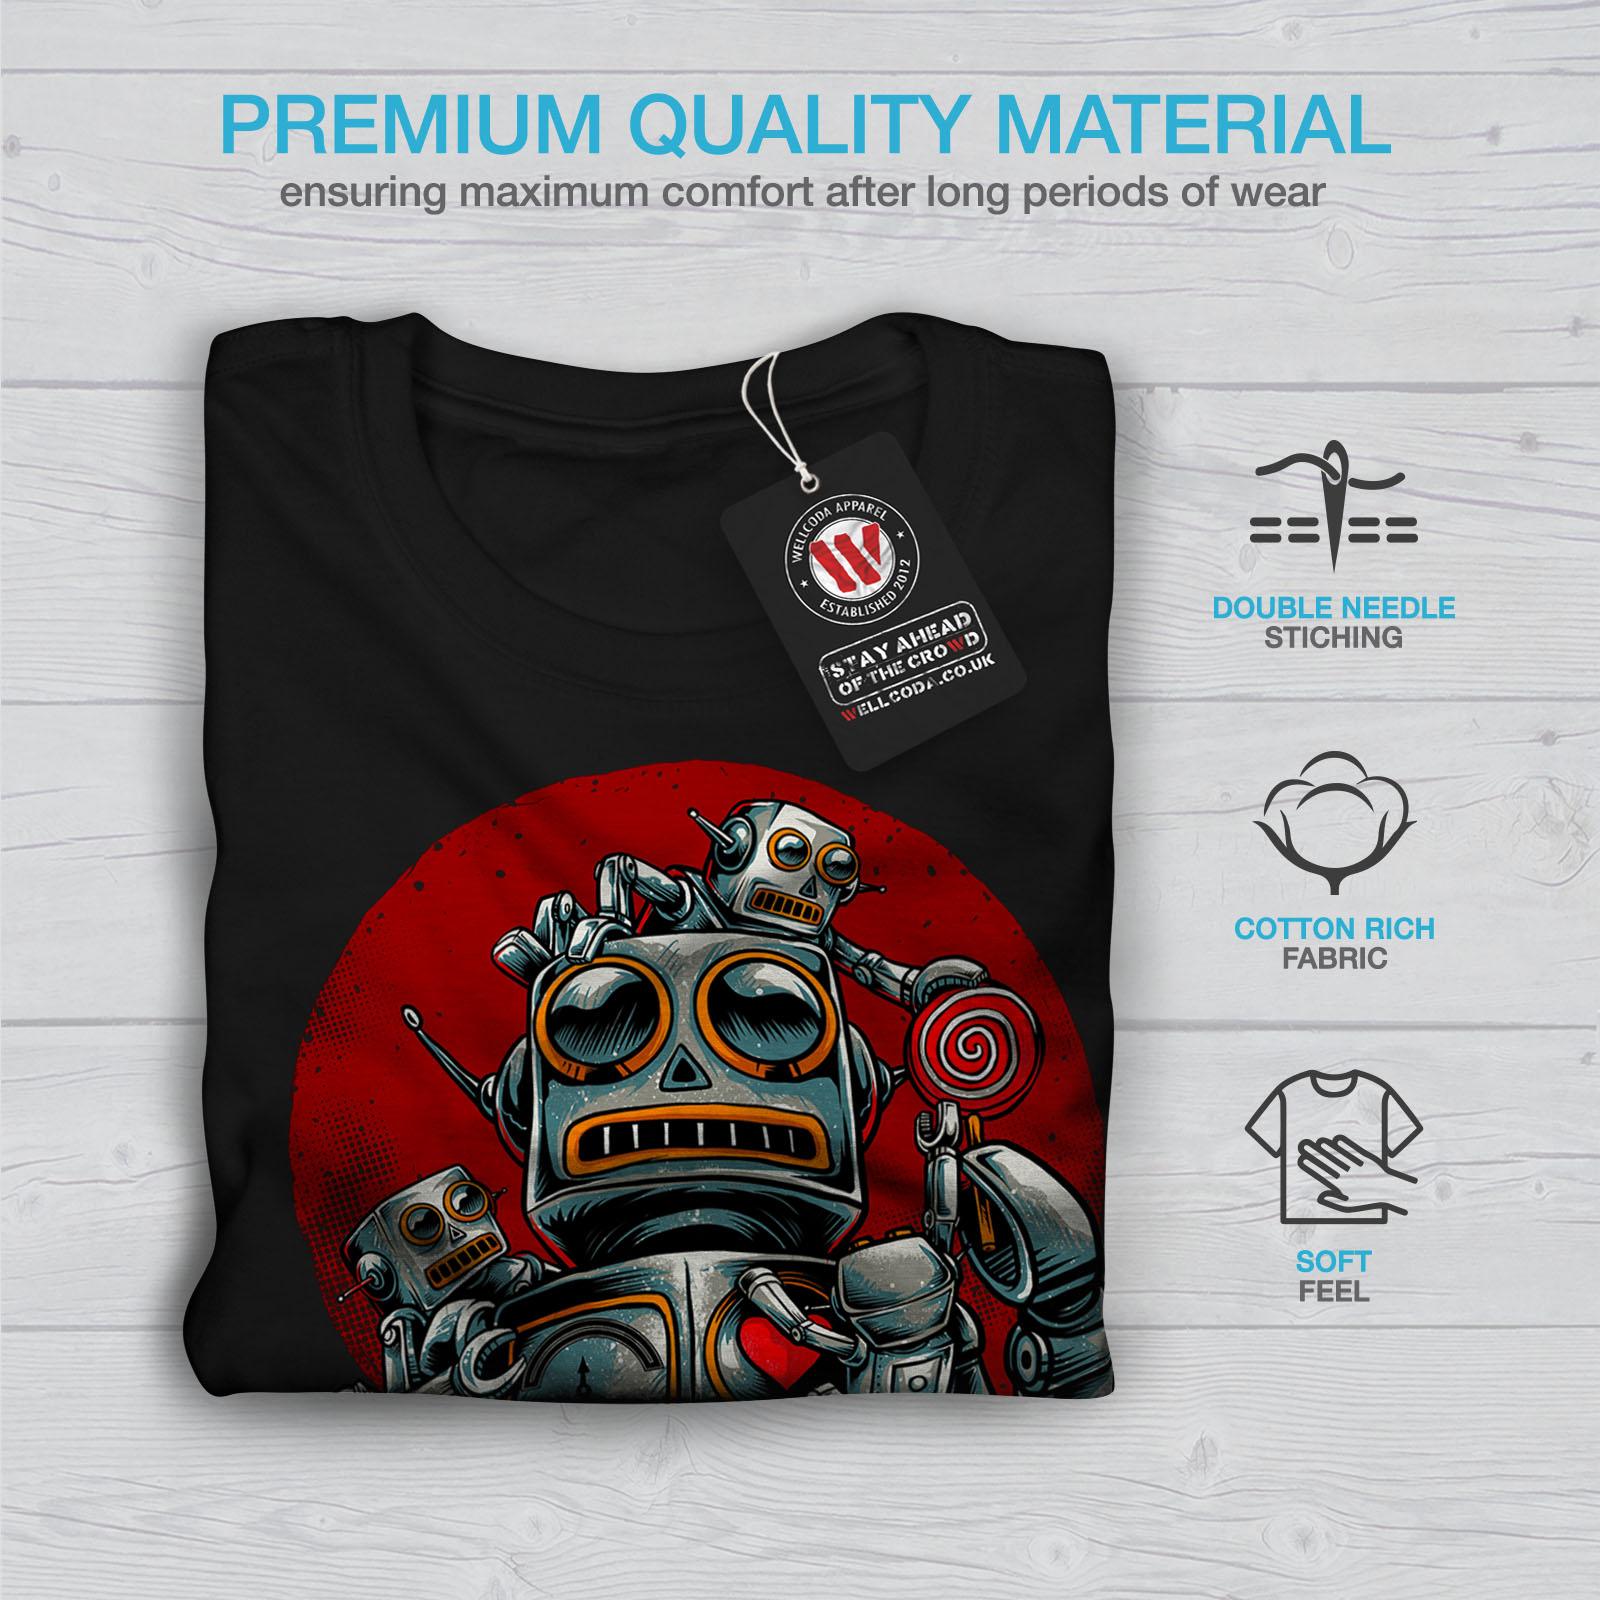 miniature 7 - Wellcoda Crazy Robot Mens T-shirt, Mechanical Graphic Design Printed Tee